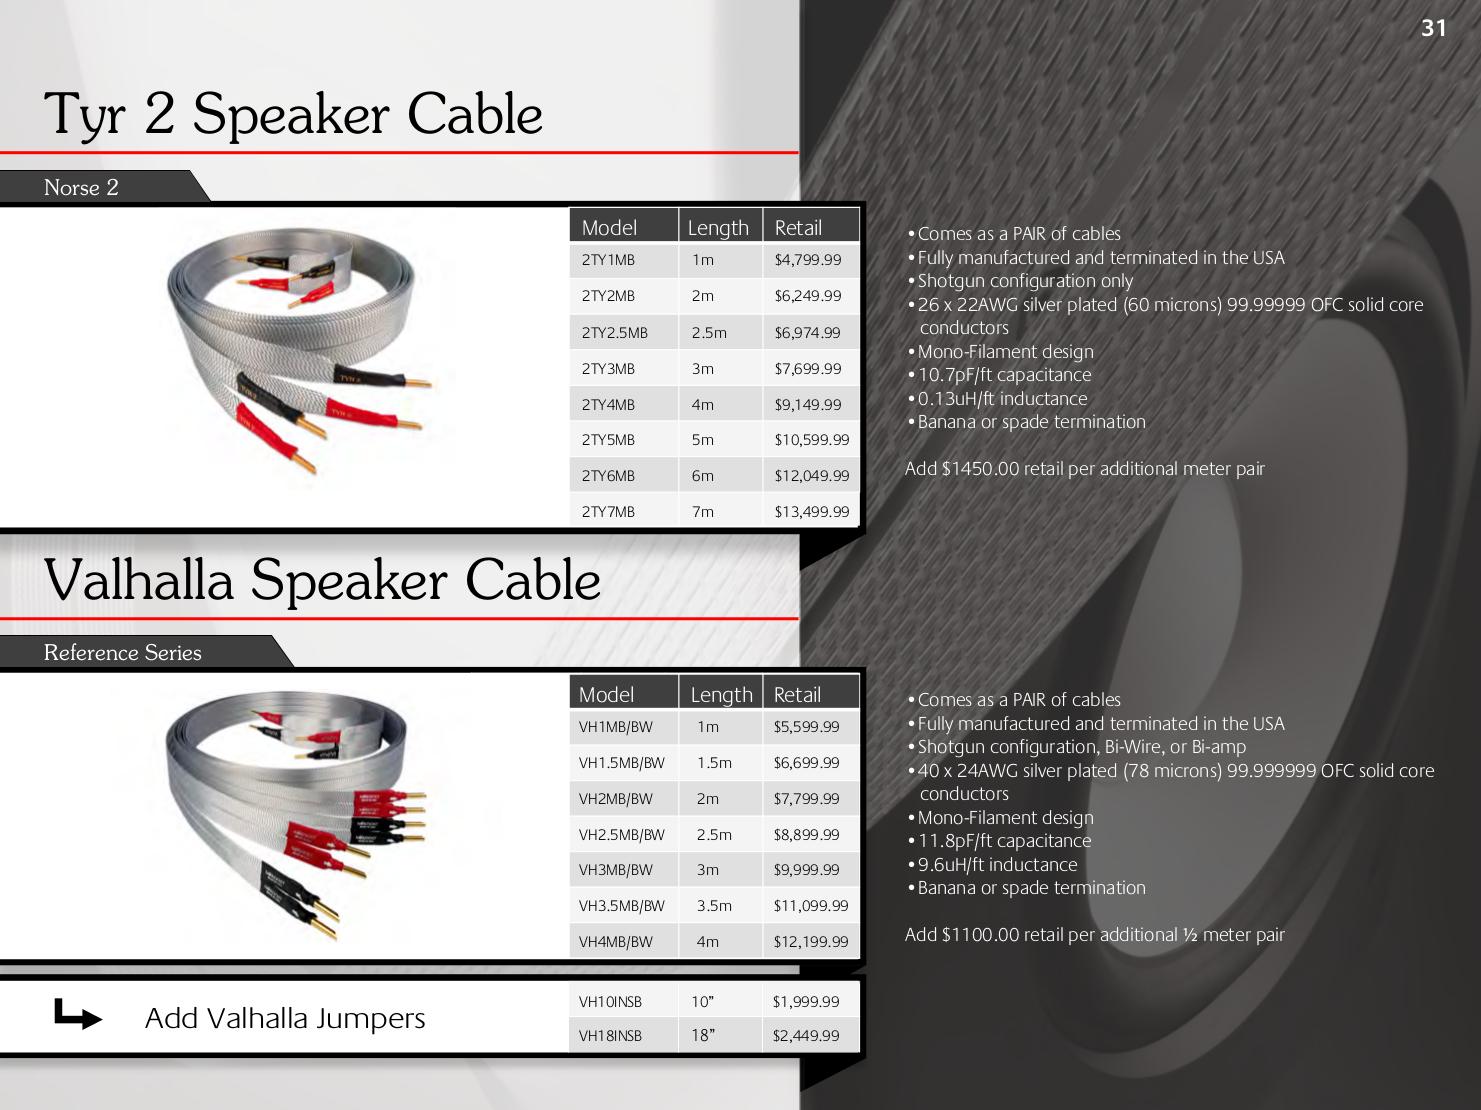 nordost valhalla reference cable jumper links x 4 for bi wire speakers rrp 2000 ebay. Black Bedroom Furniture Sets. Home Design Ideas